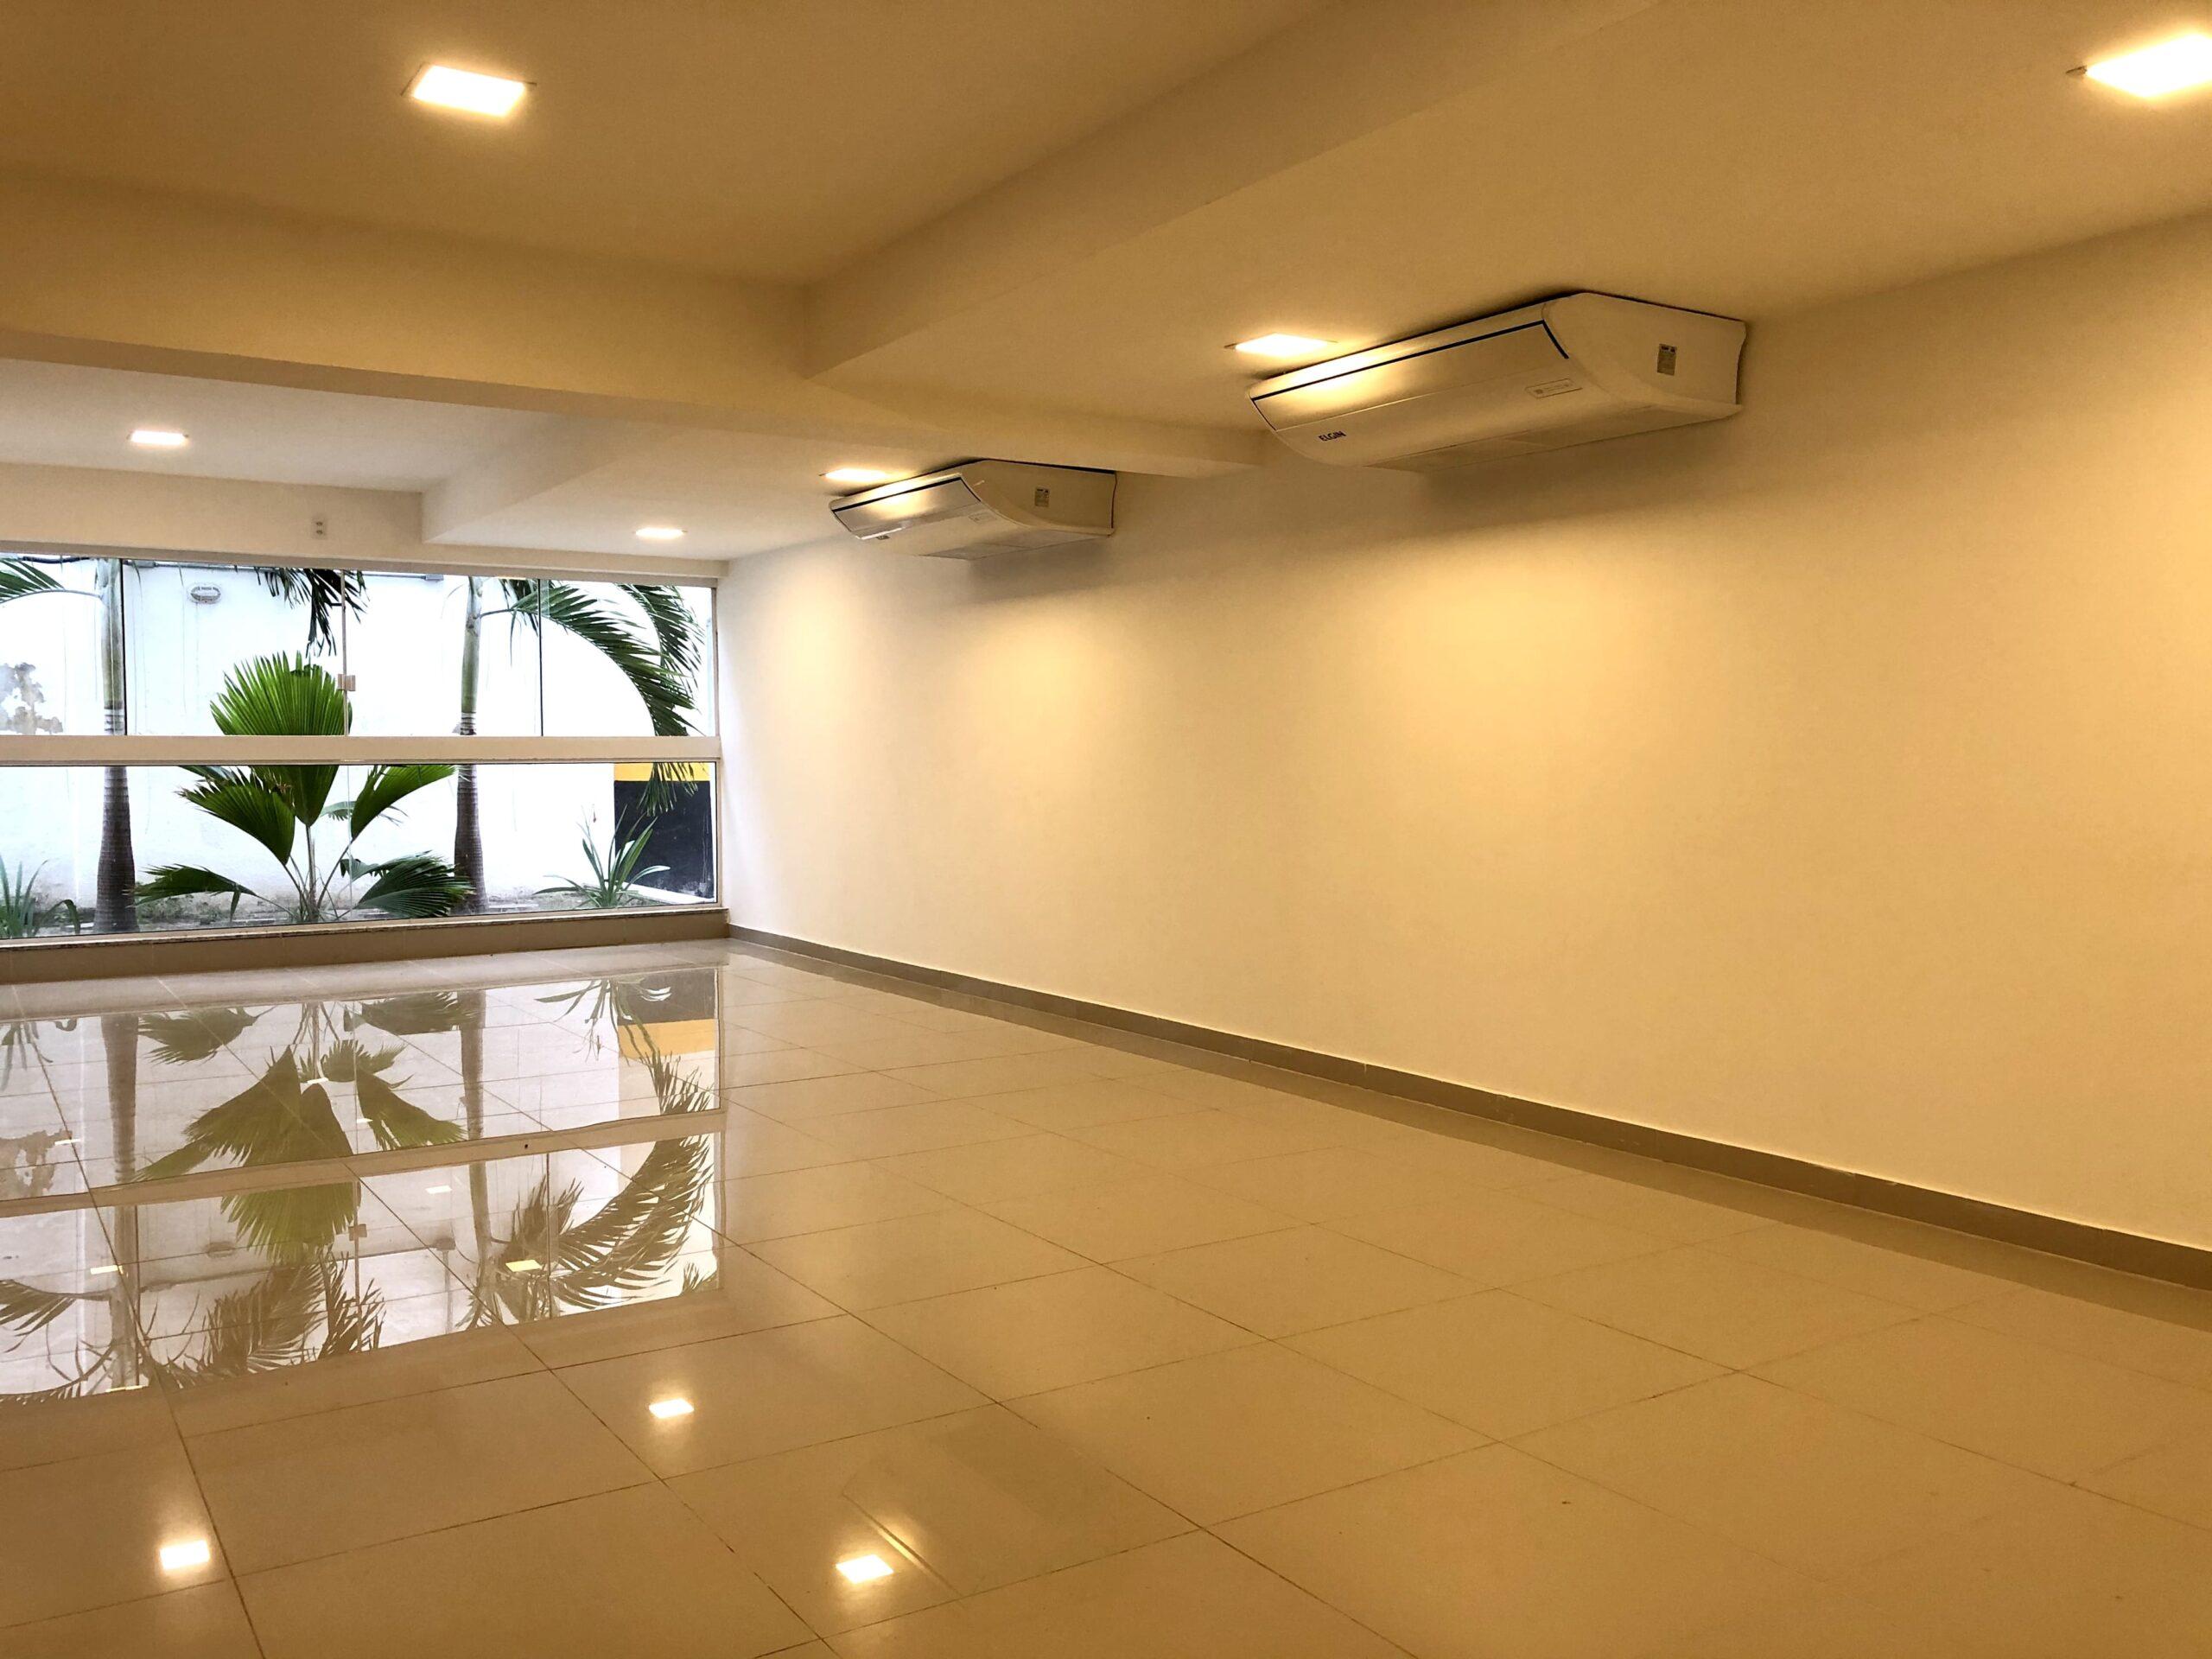 Apartamento para venda Edifício Recanto das Palmeiras Teresina, 3 quartos sendo 1 suíte